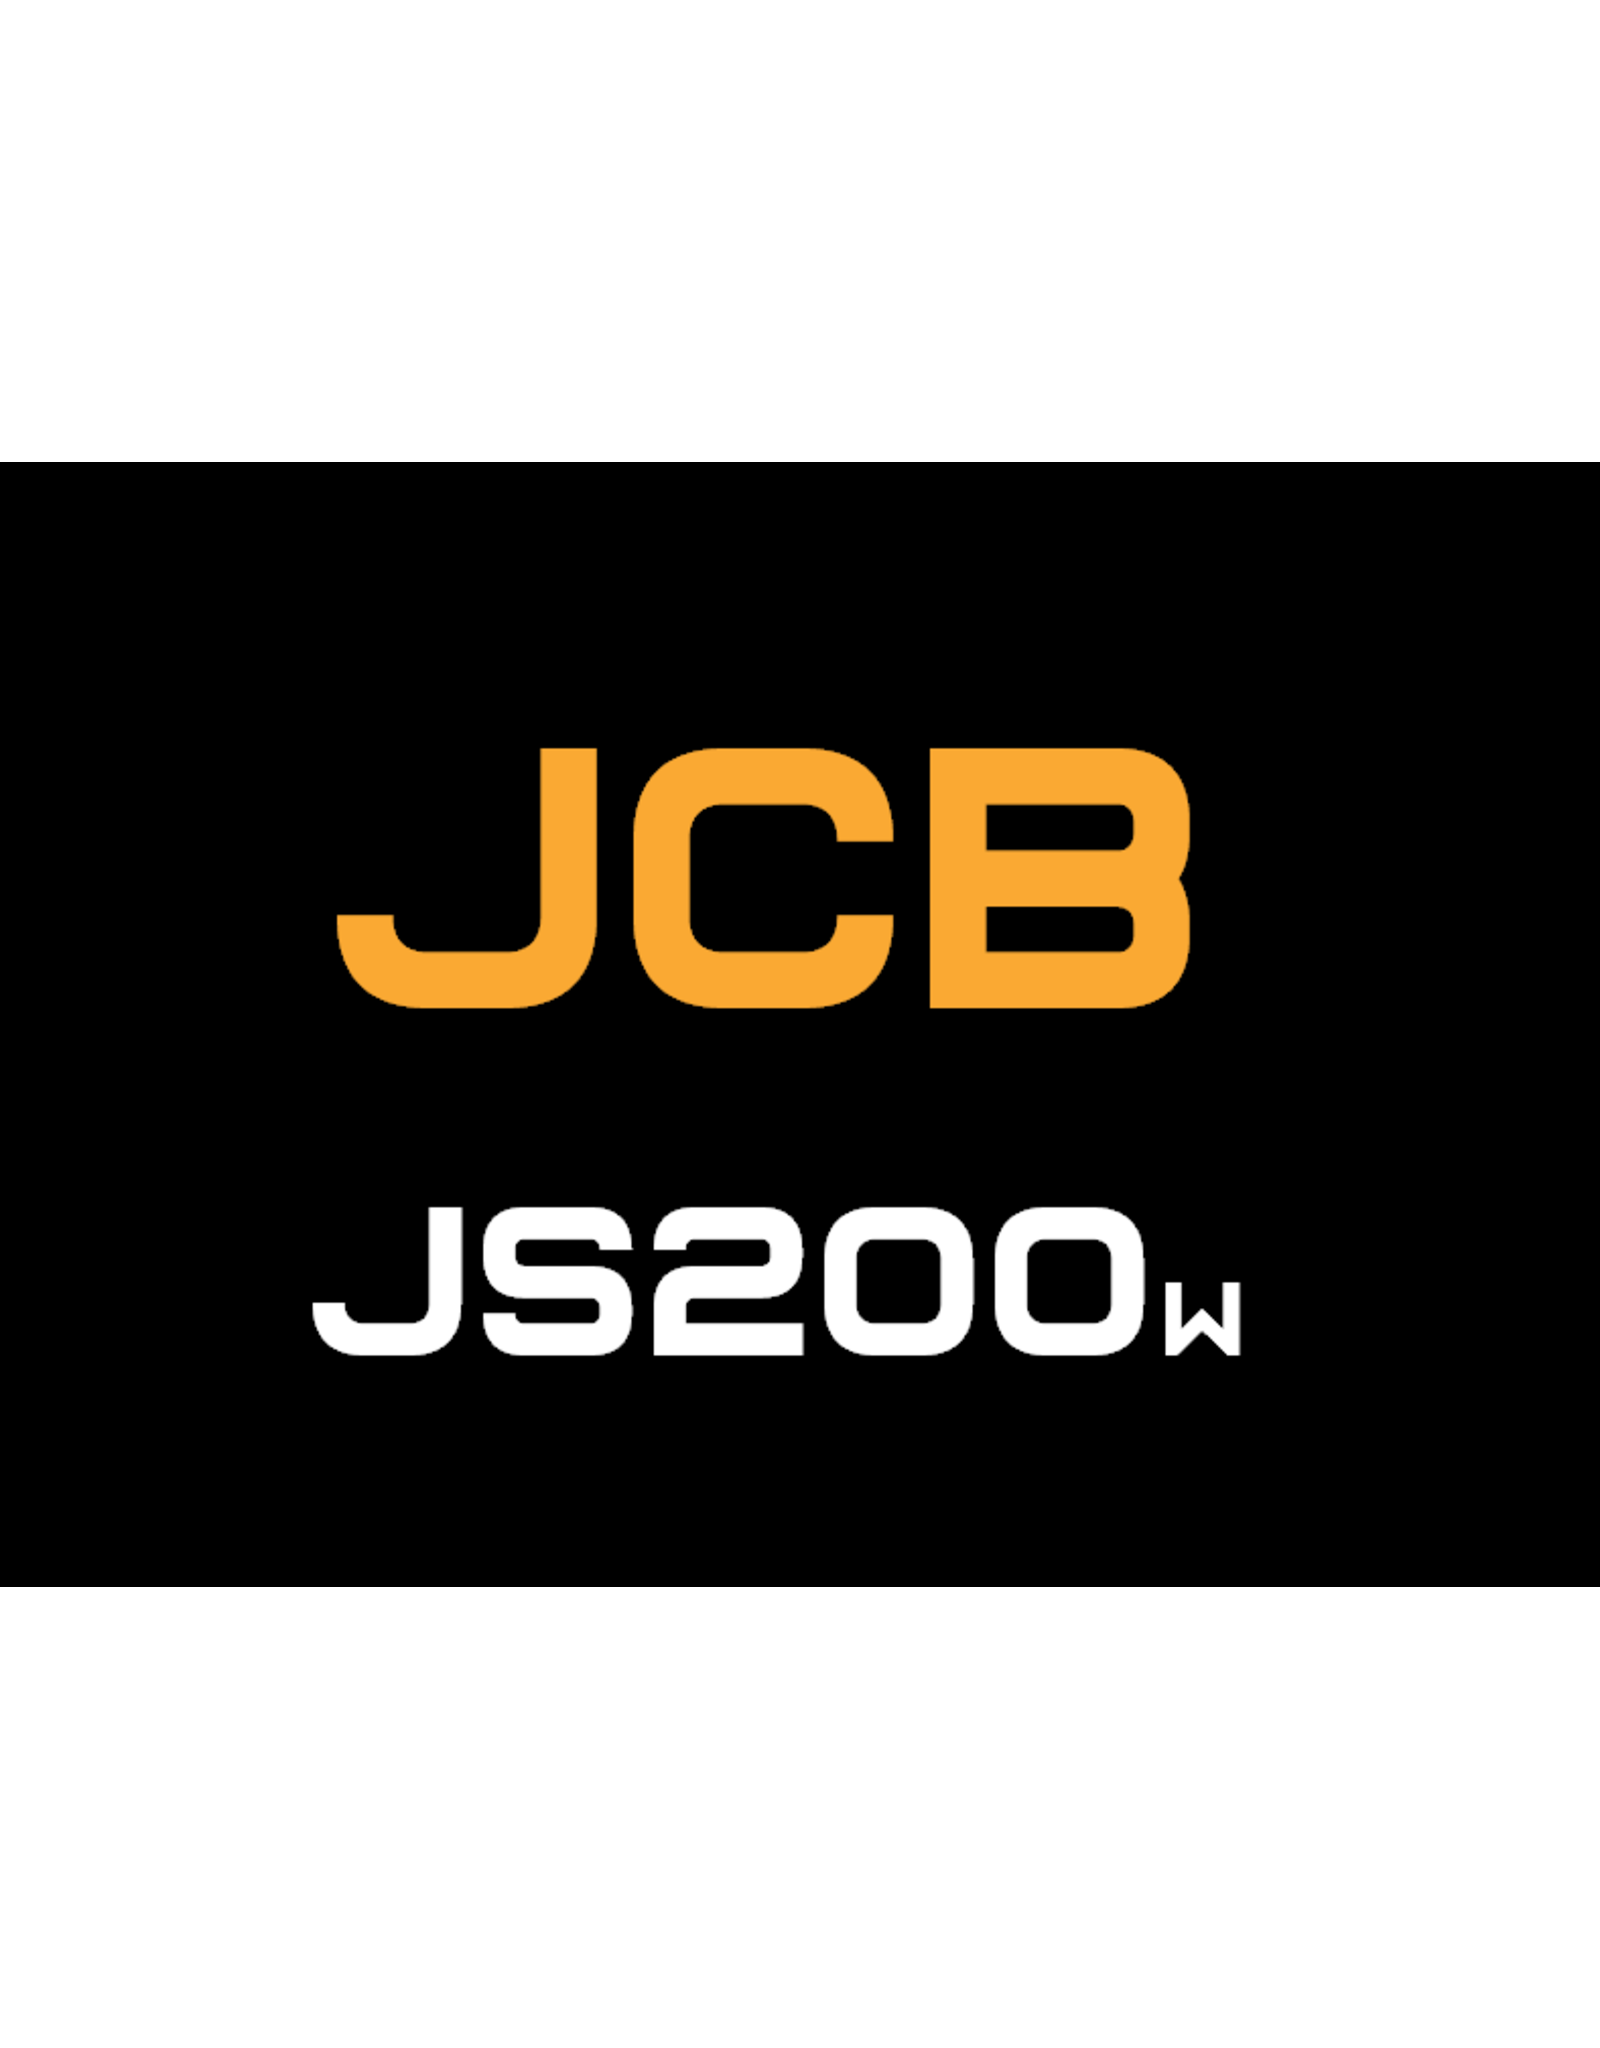 Echle Hartstahl GmbH FOPS für JCB JS200W